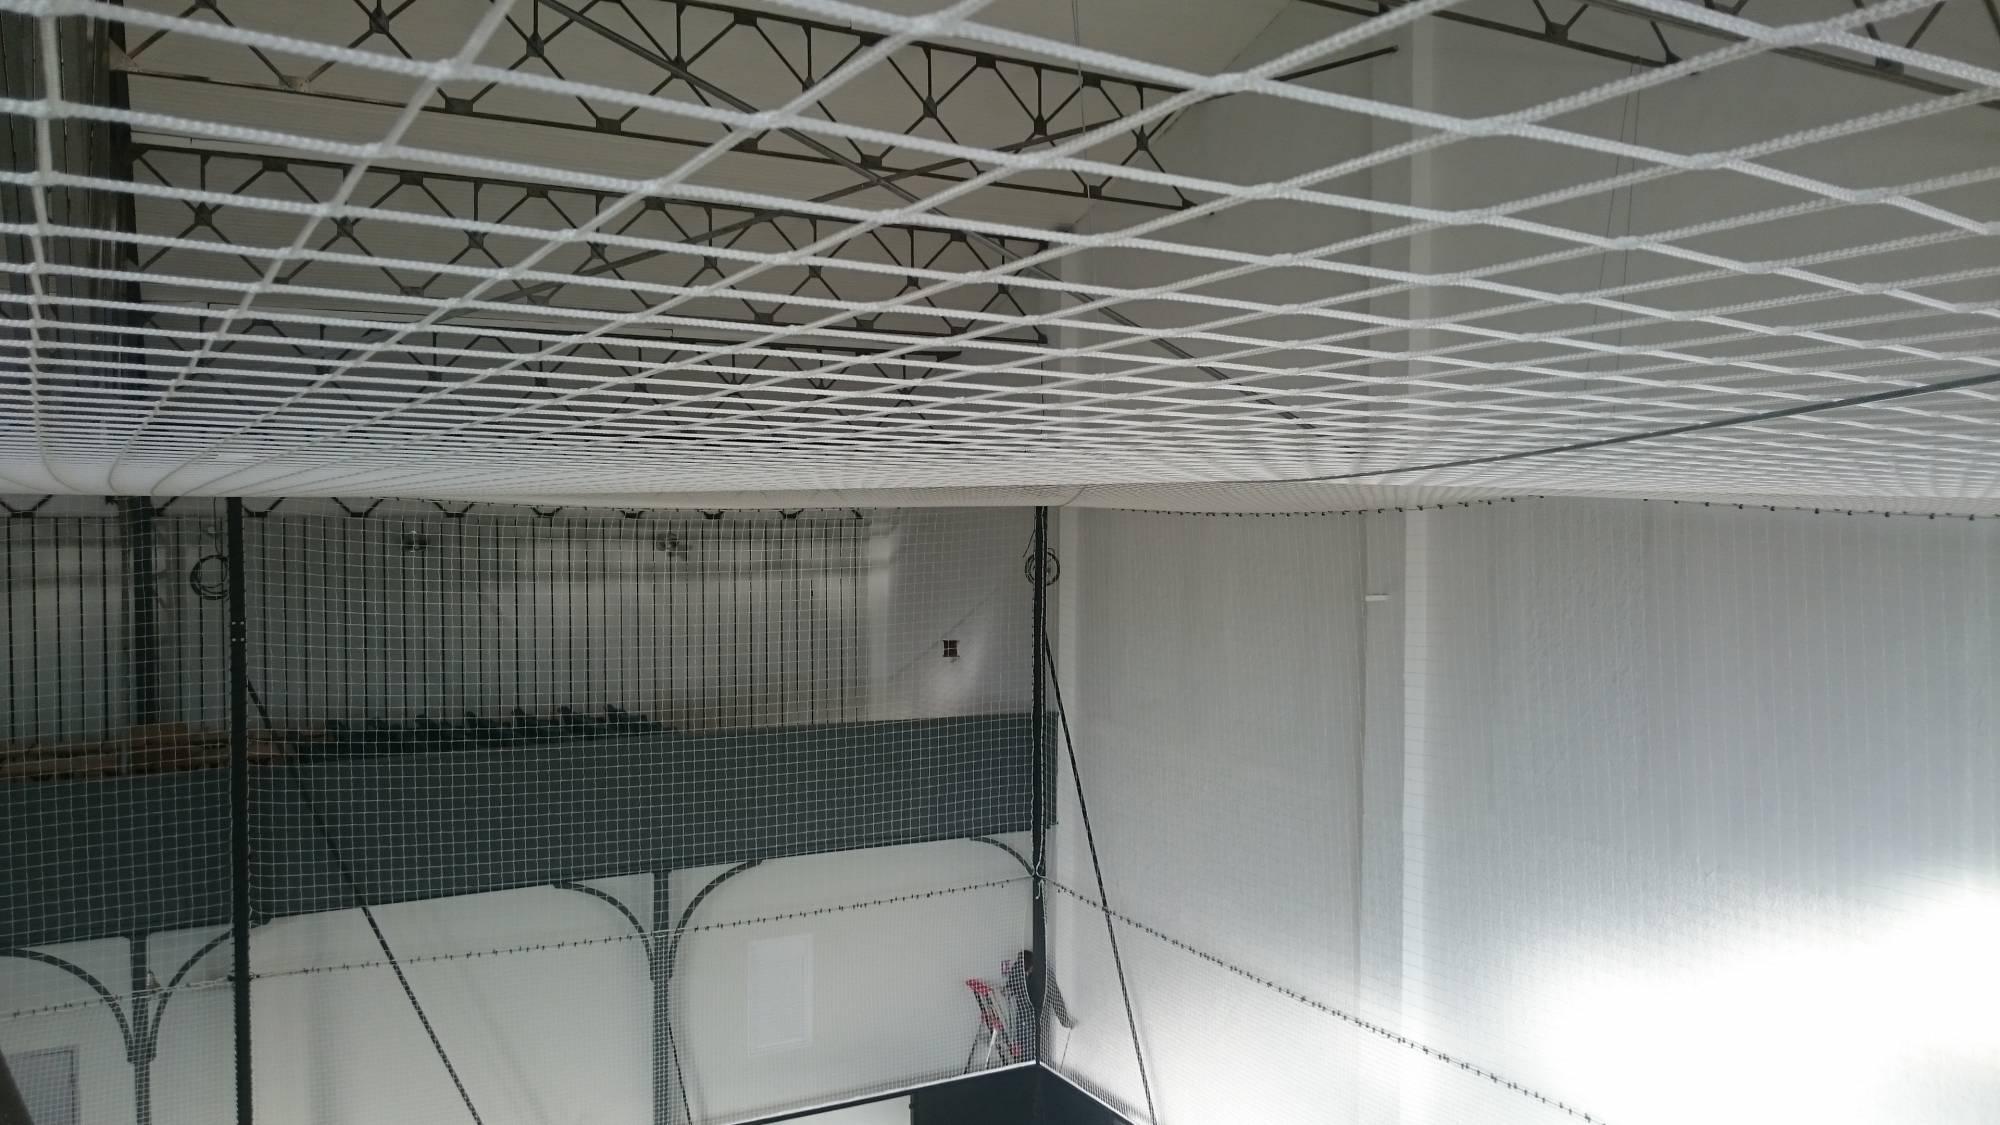 installateur de filet de foot 5c5